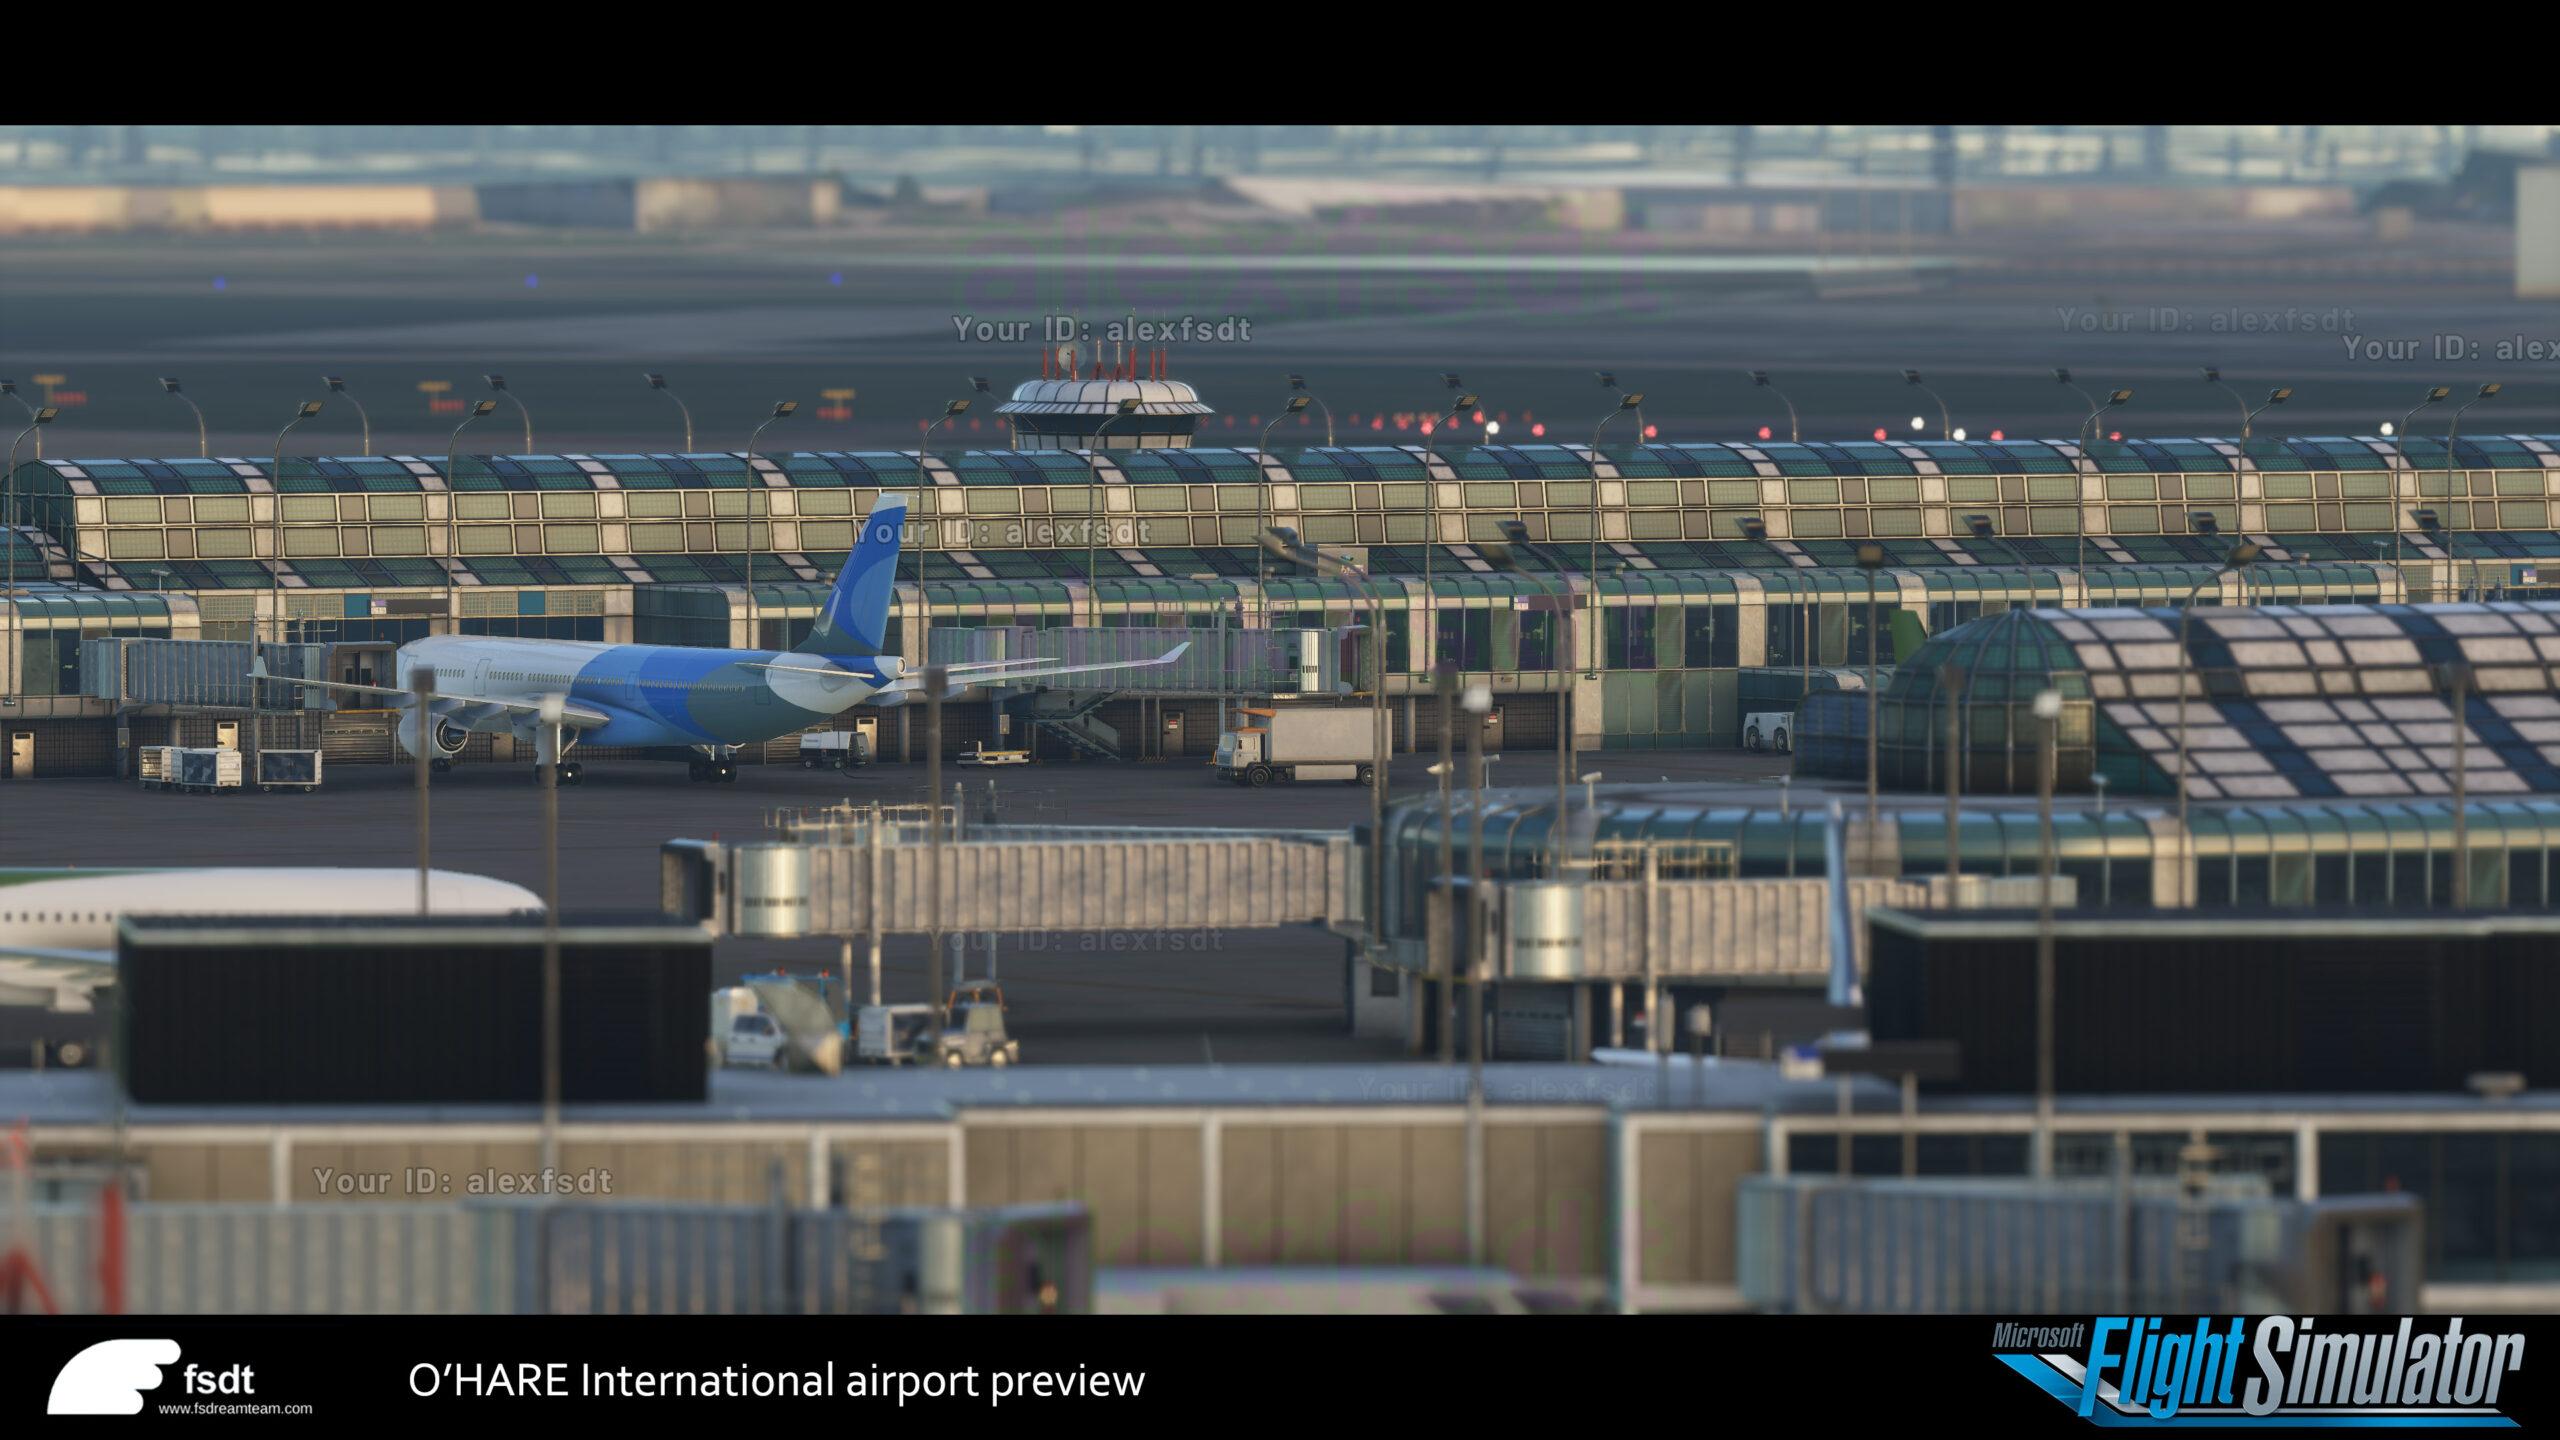 New O'Hare screenshots for the upcoming Microsoft Flight Simulator